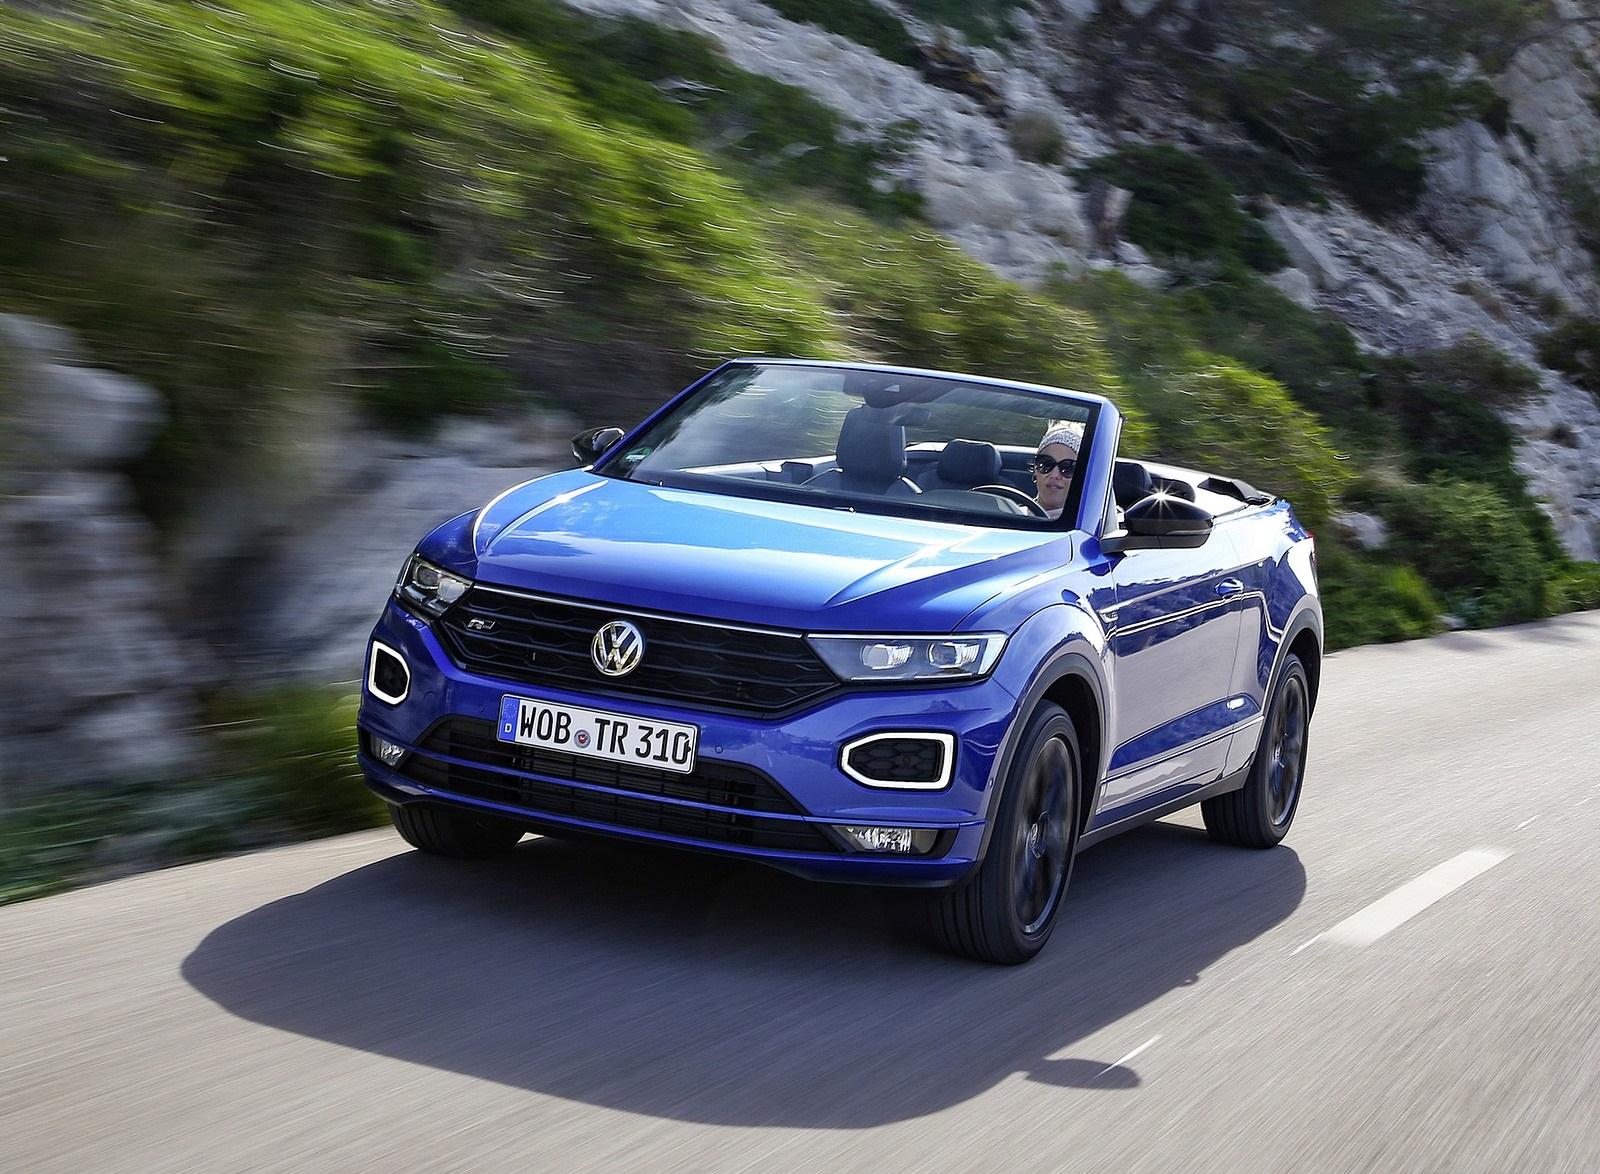 2020 Volkswagen T-Roc Cabriolet Front Three-Quarter Wallpapers (3)